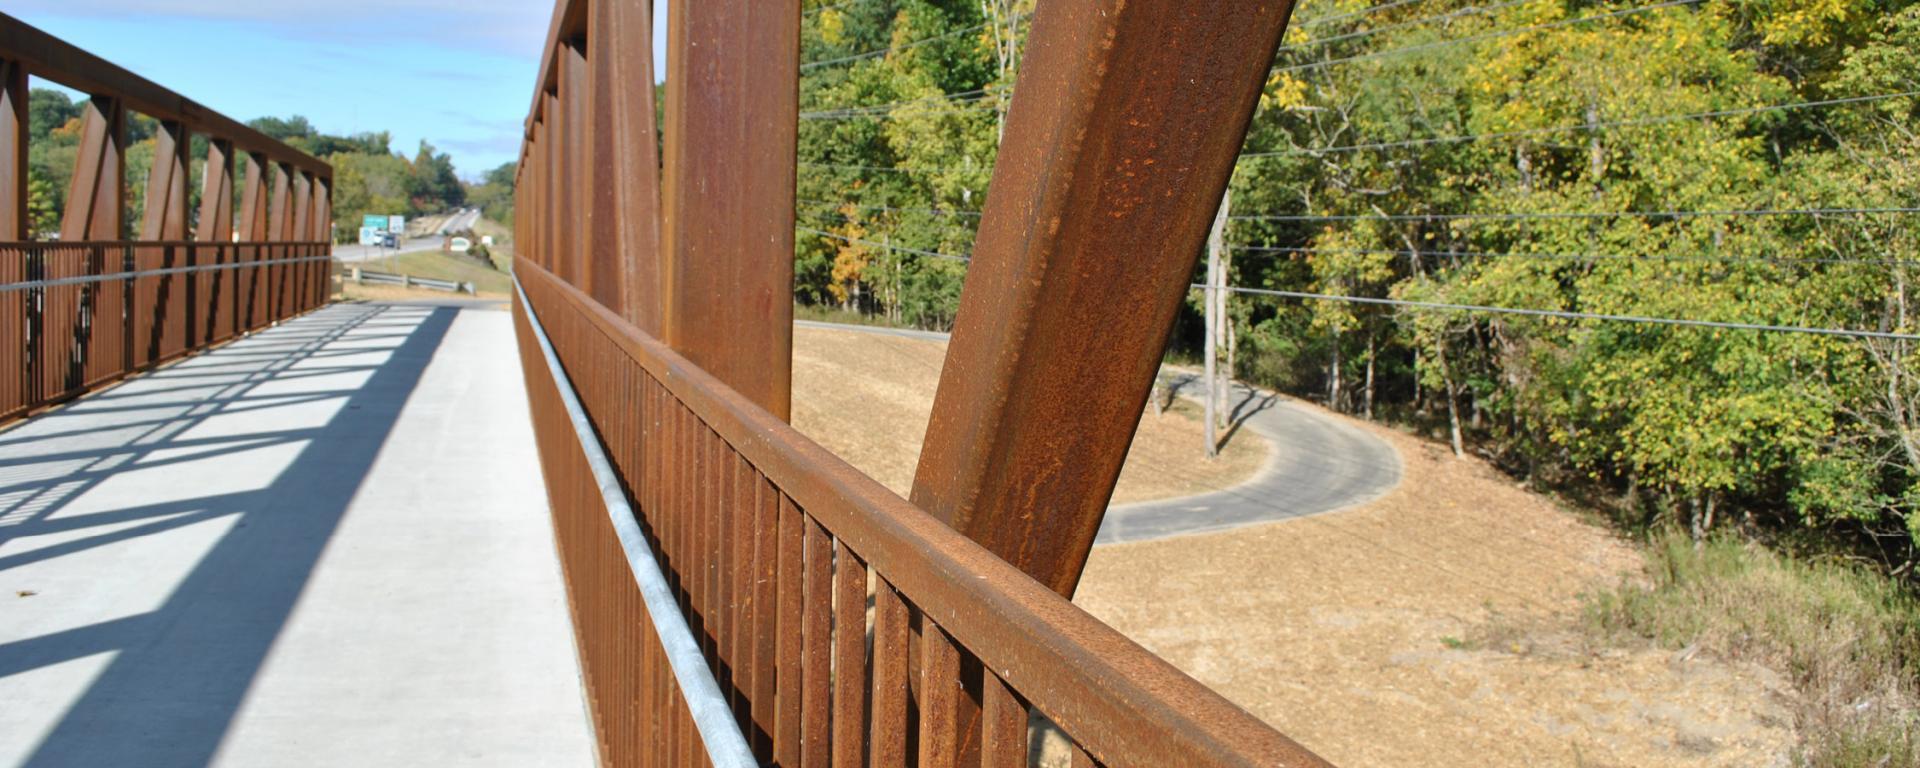 bridge over winding walking trail